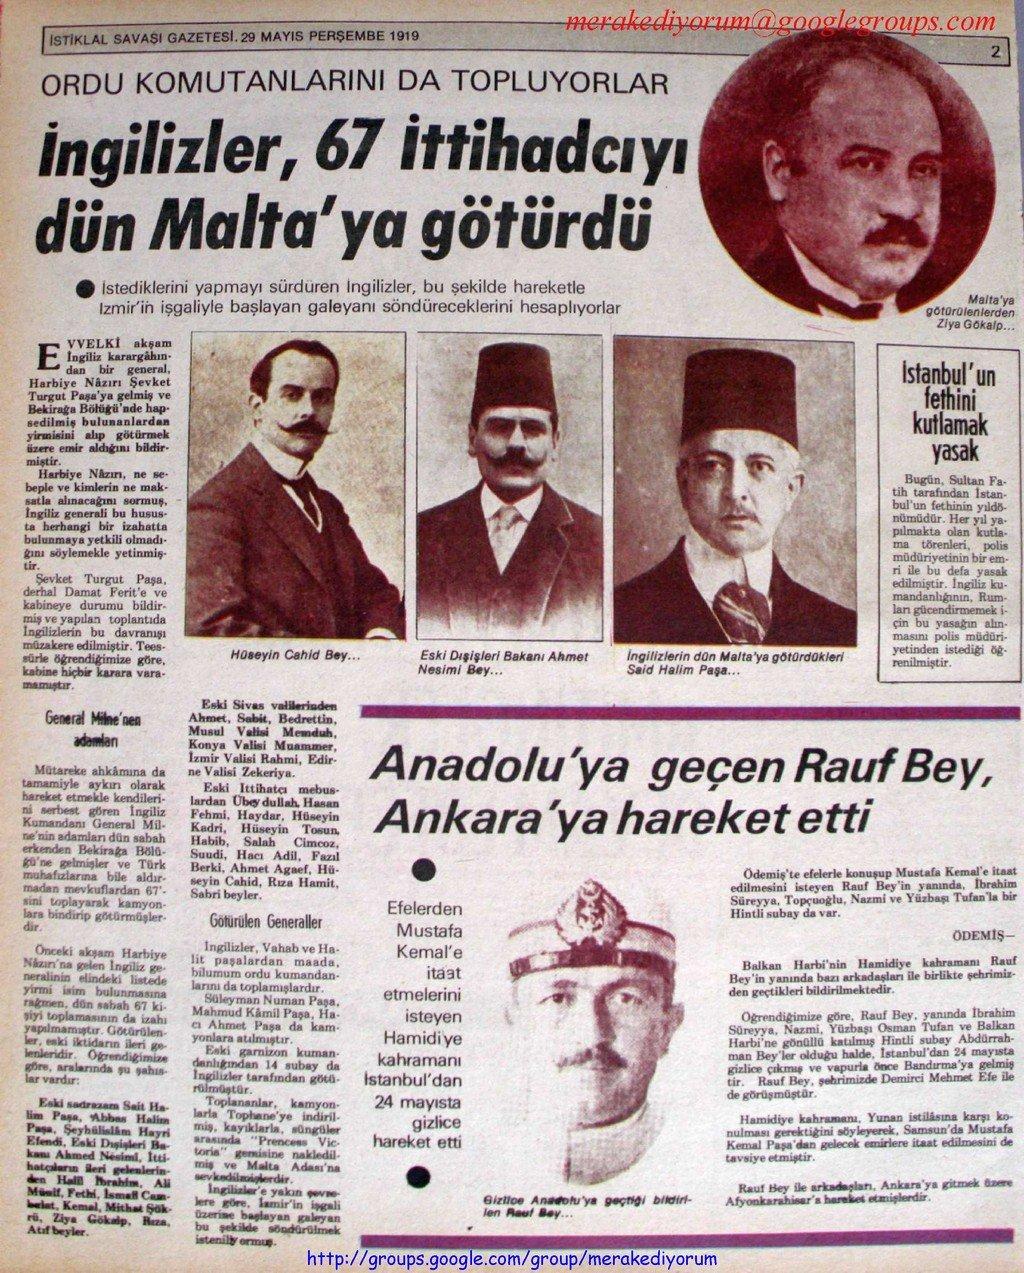 istiklal savaşı gazetesi - 29 mayıs 1919